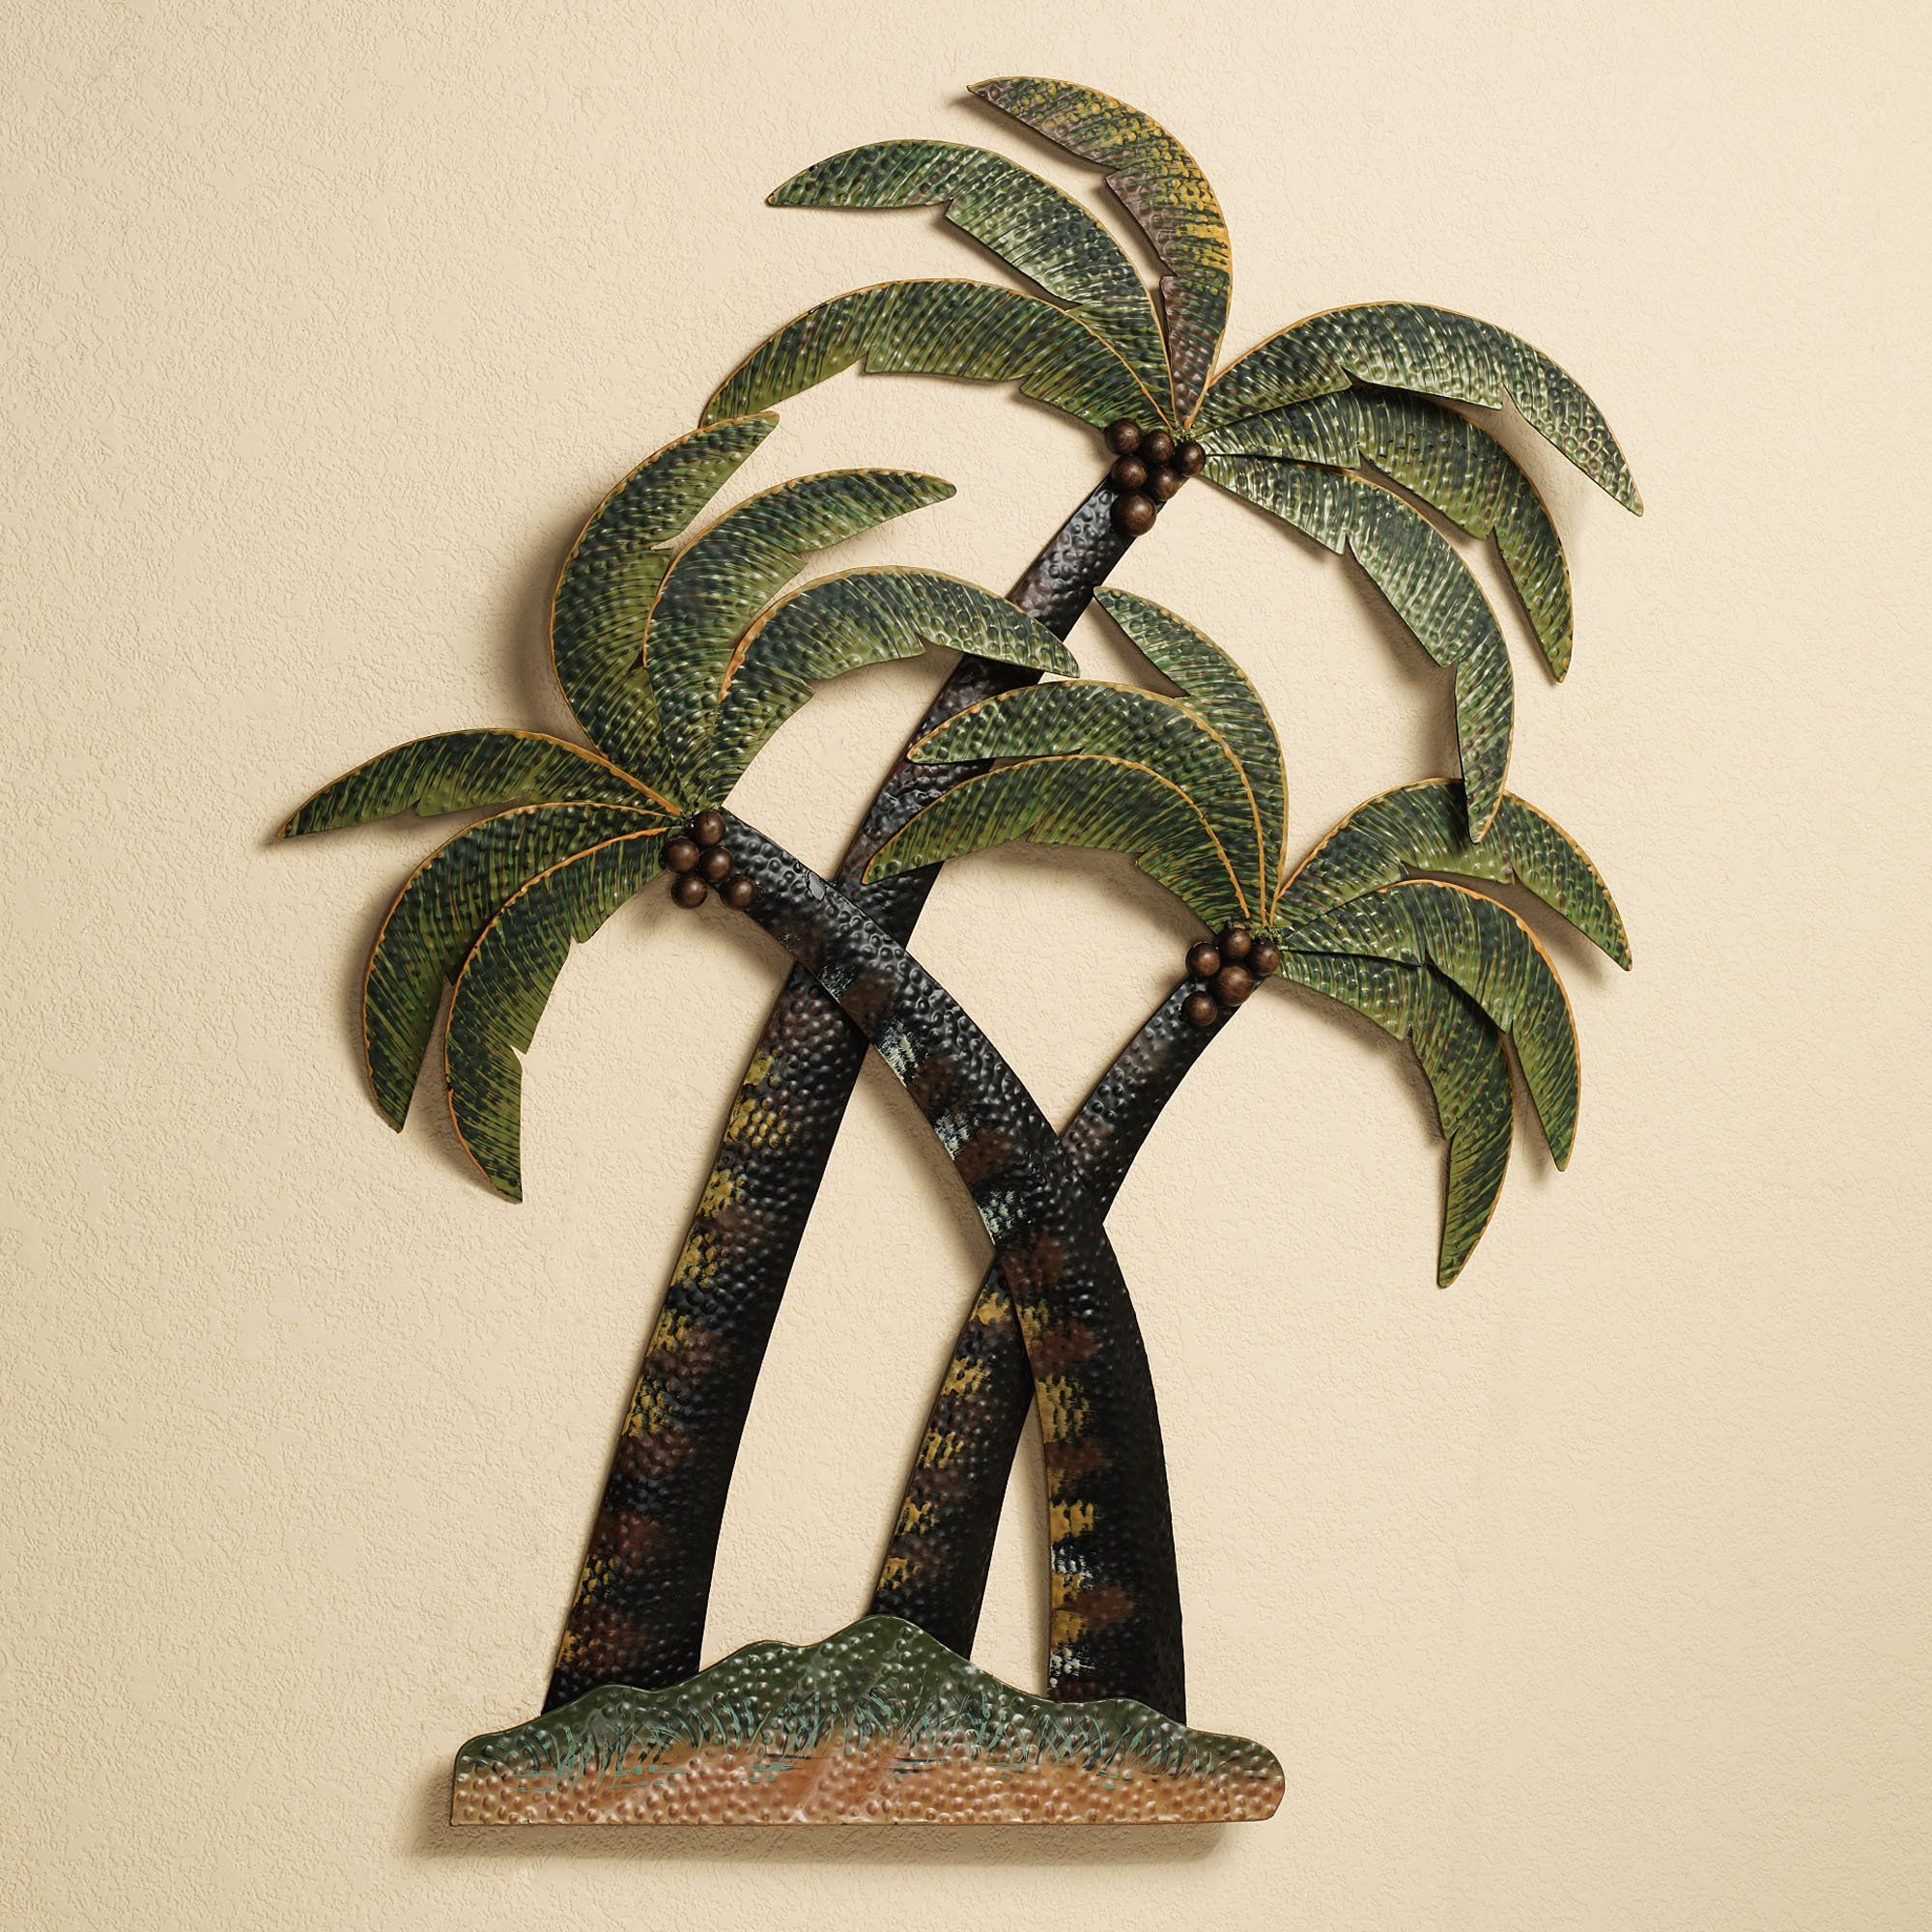 Coco Palm Tree Metal Wall Sculpture Palm Tree Metal Wall Art Palm Tree Wall Art Metal Tree Palm tree metal wall art